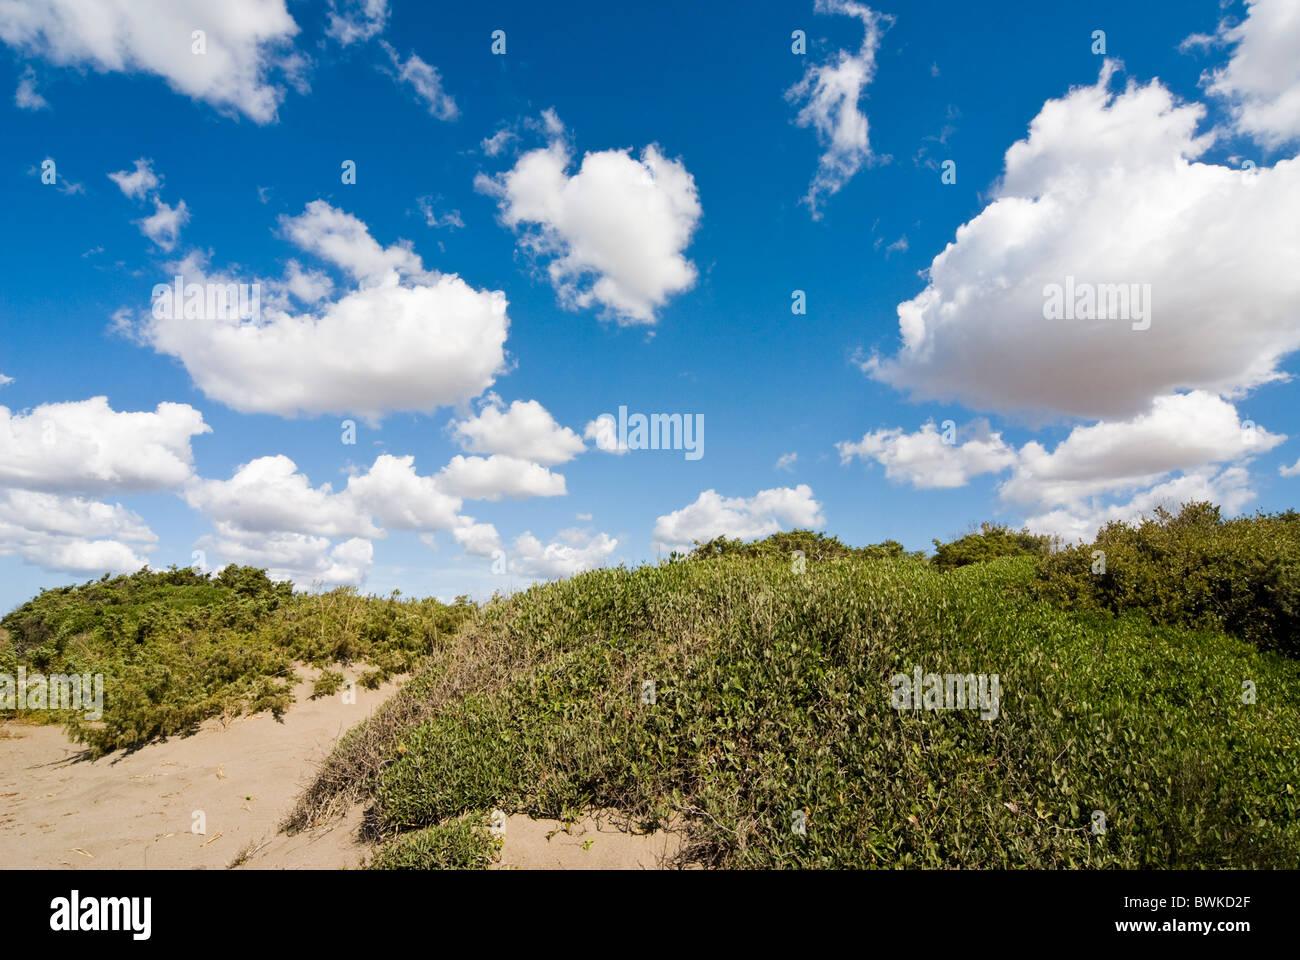 Capalbio Beach, Capalbio, Grosseto Province, Tuscany, Italy - Stock Image